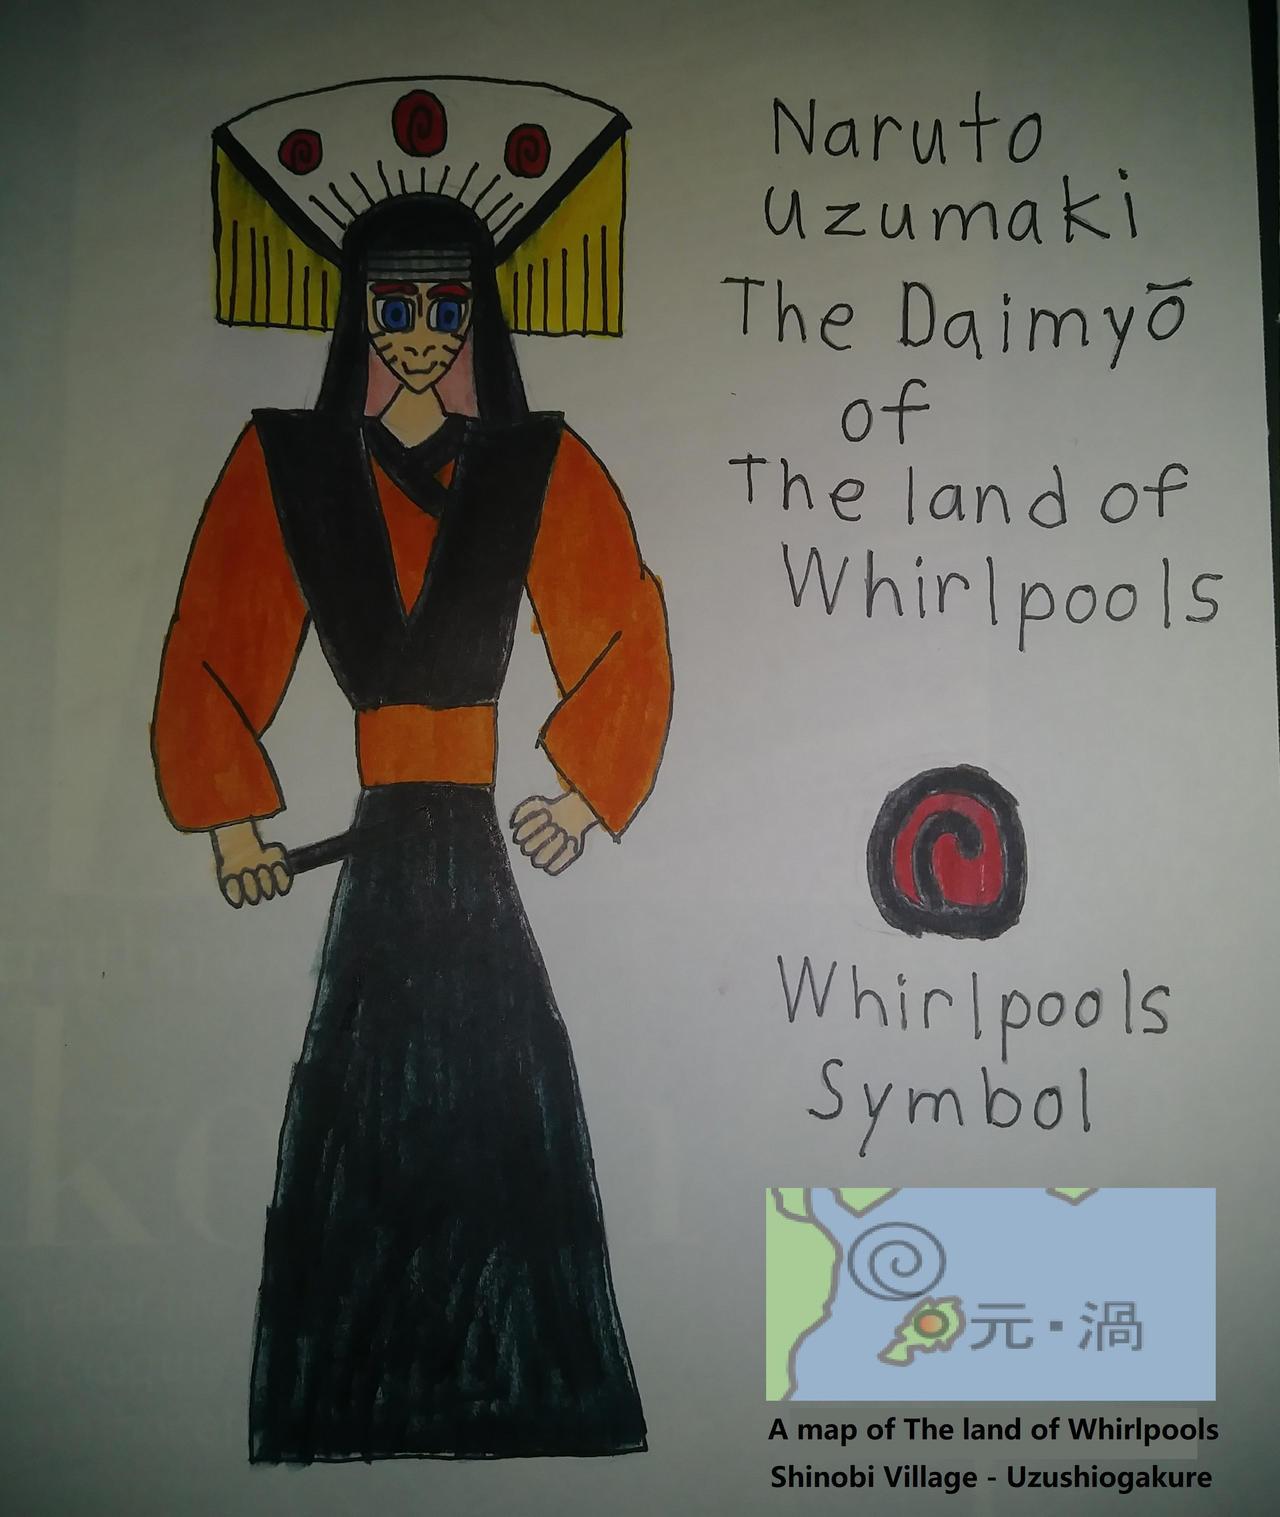 Whirlpool Daimyo Naruto by James620 on DeviantArt